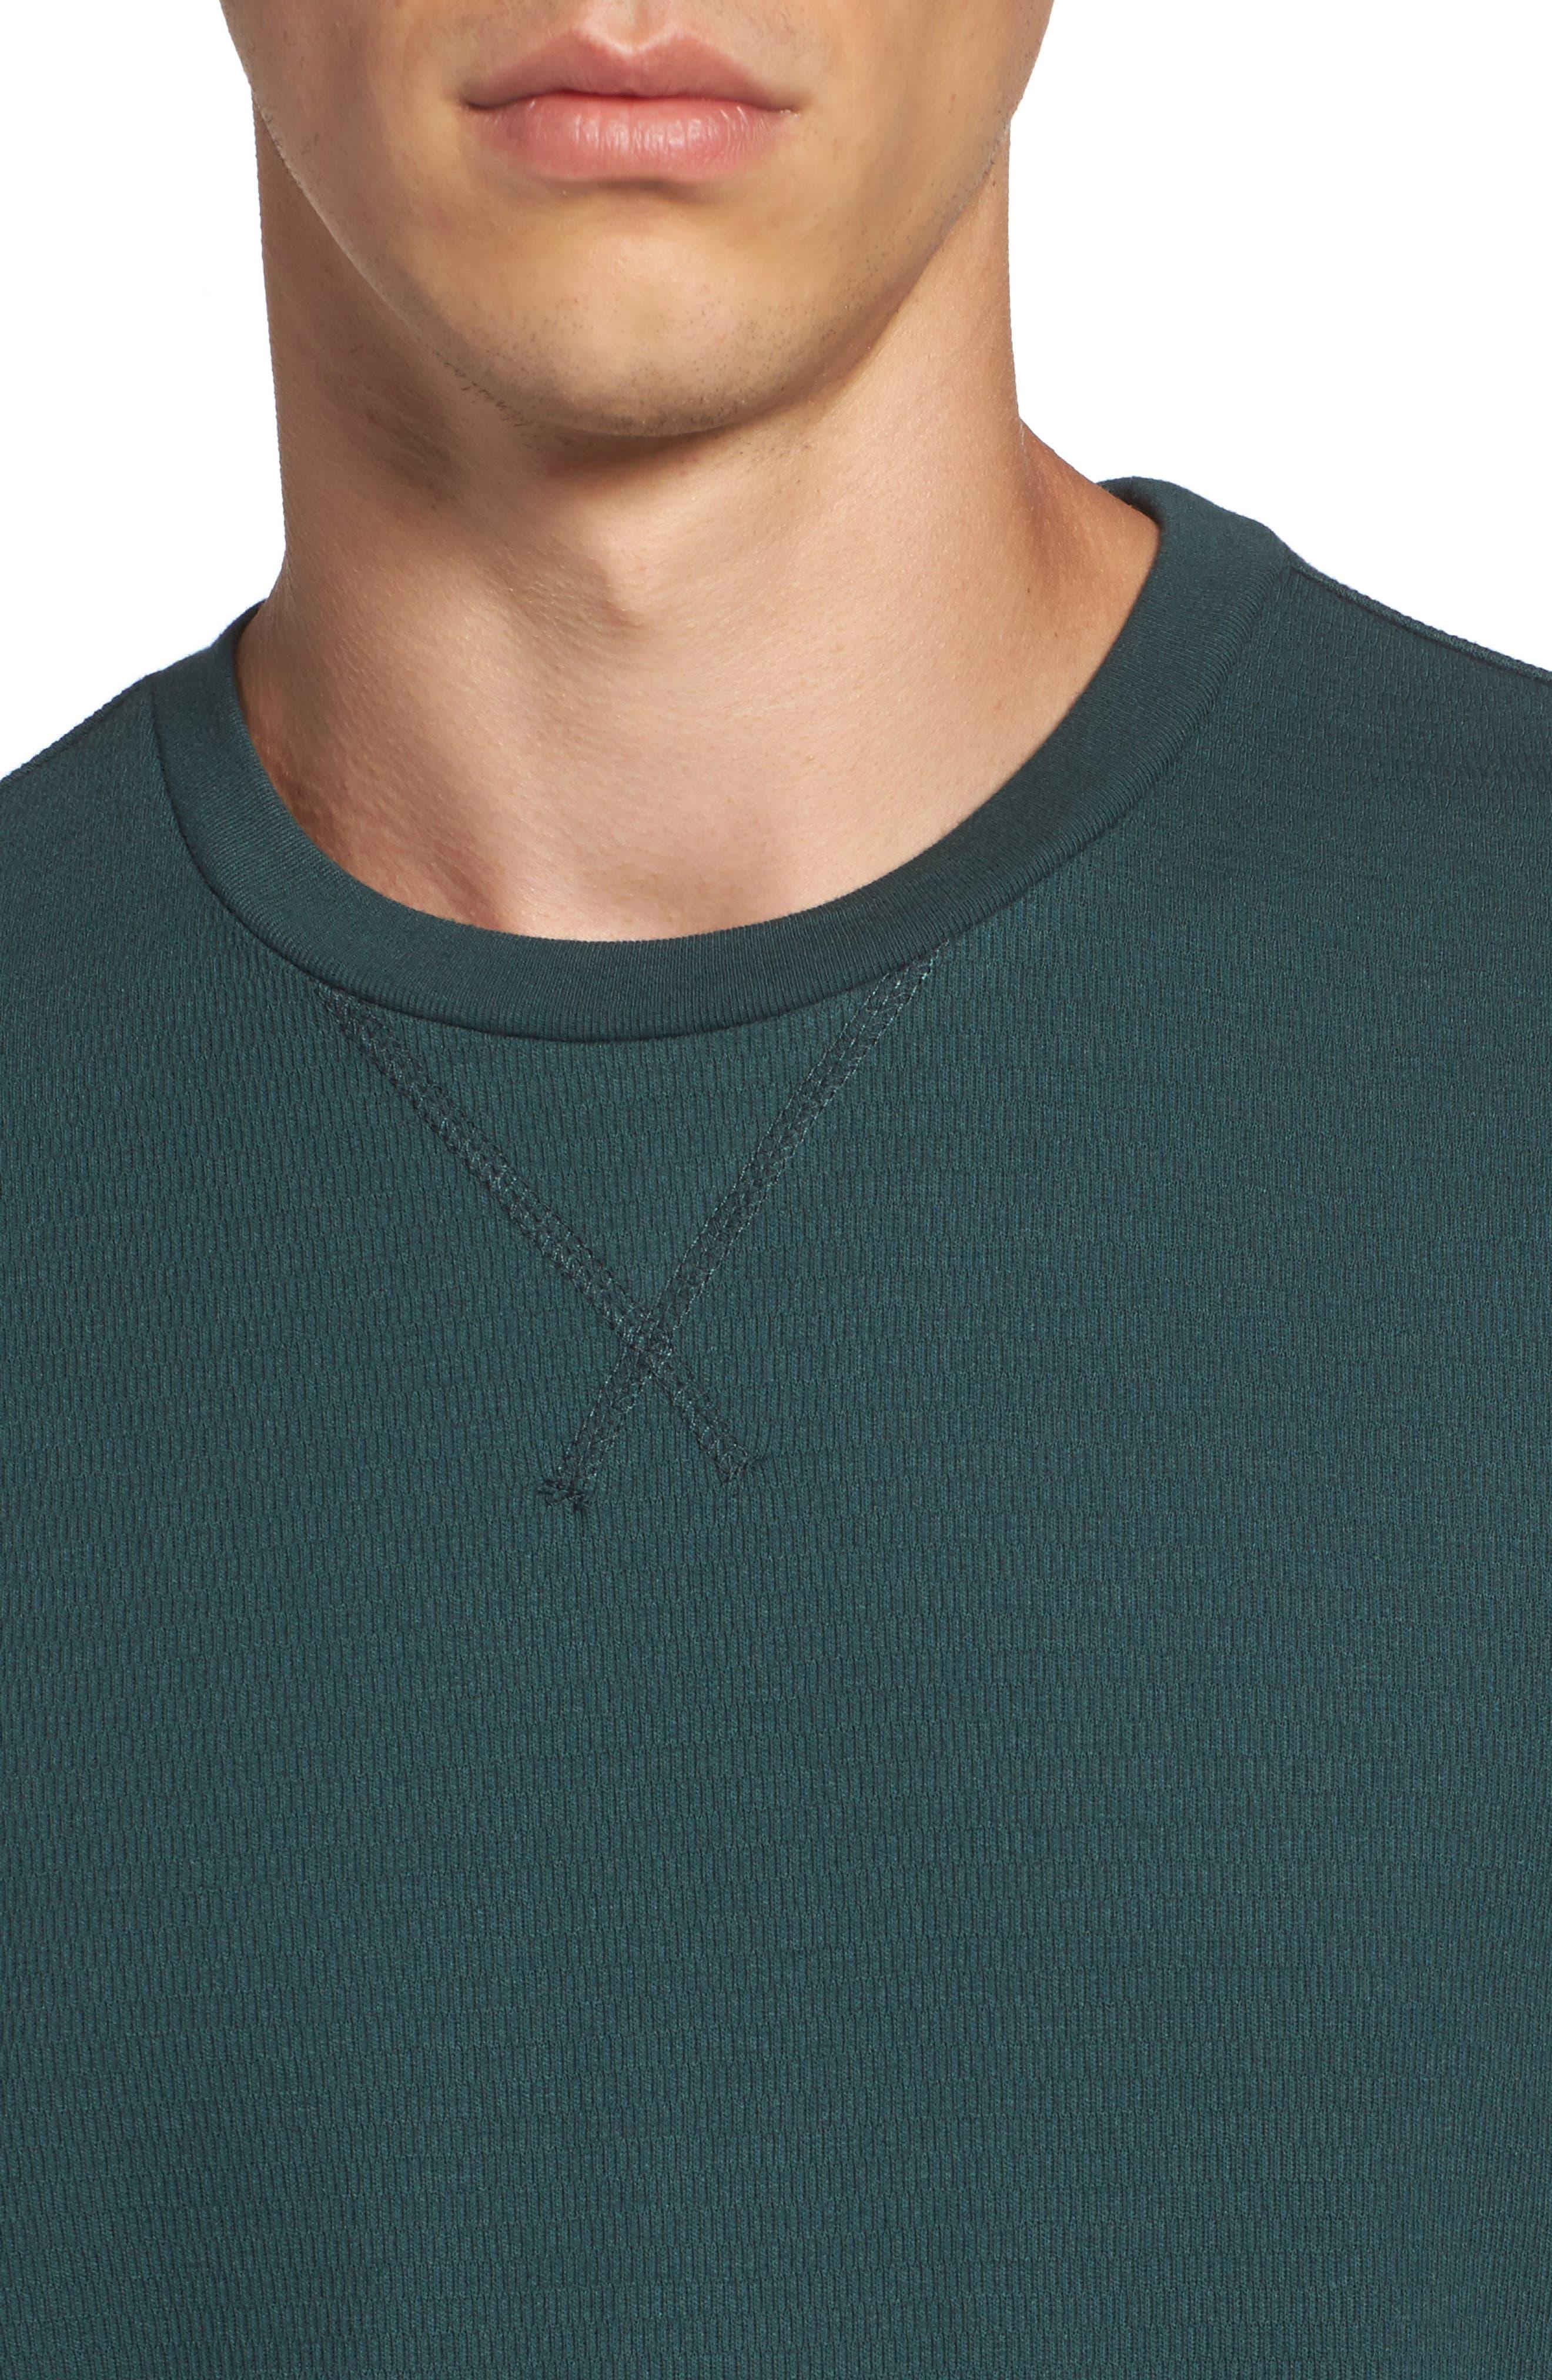 Longline Thermal T-Shirt,                             Alternate thumbnail 12, color,